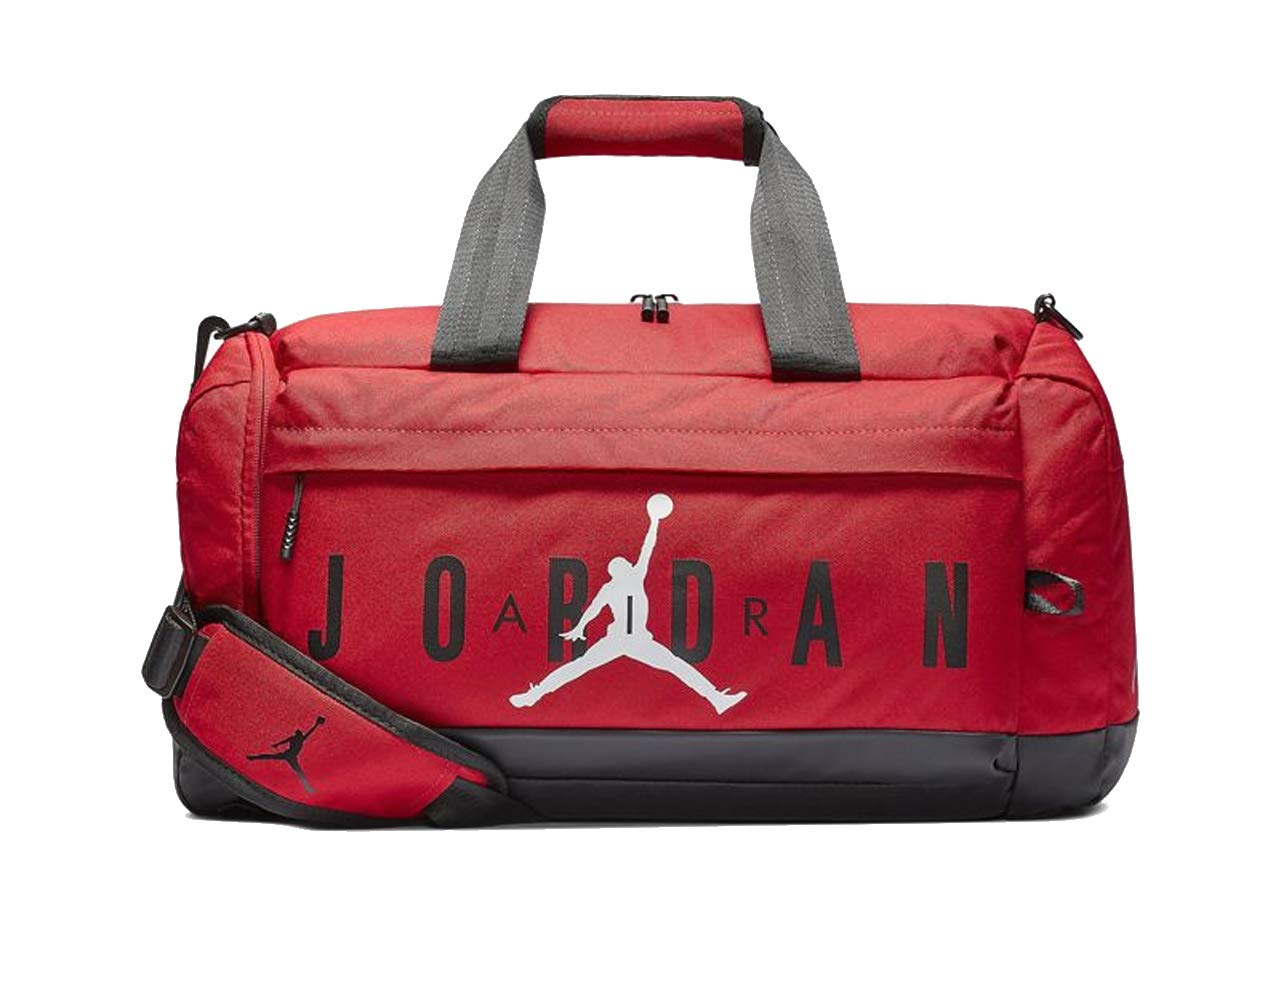 Amazon.com: Nike Air Jordan Velocity - Bolsa de deporte ...